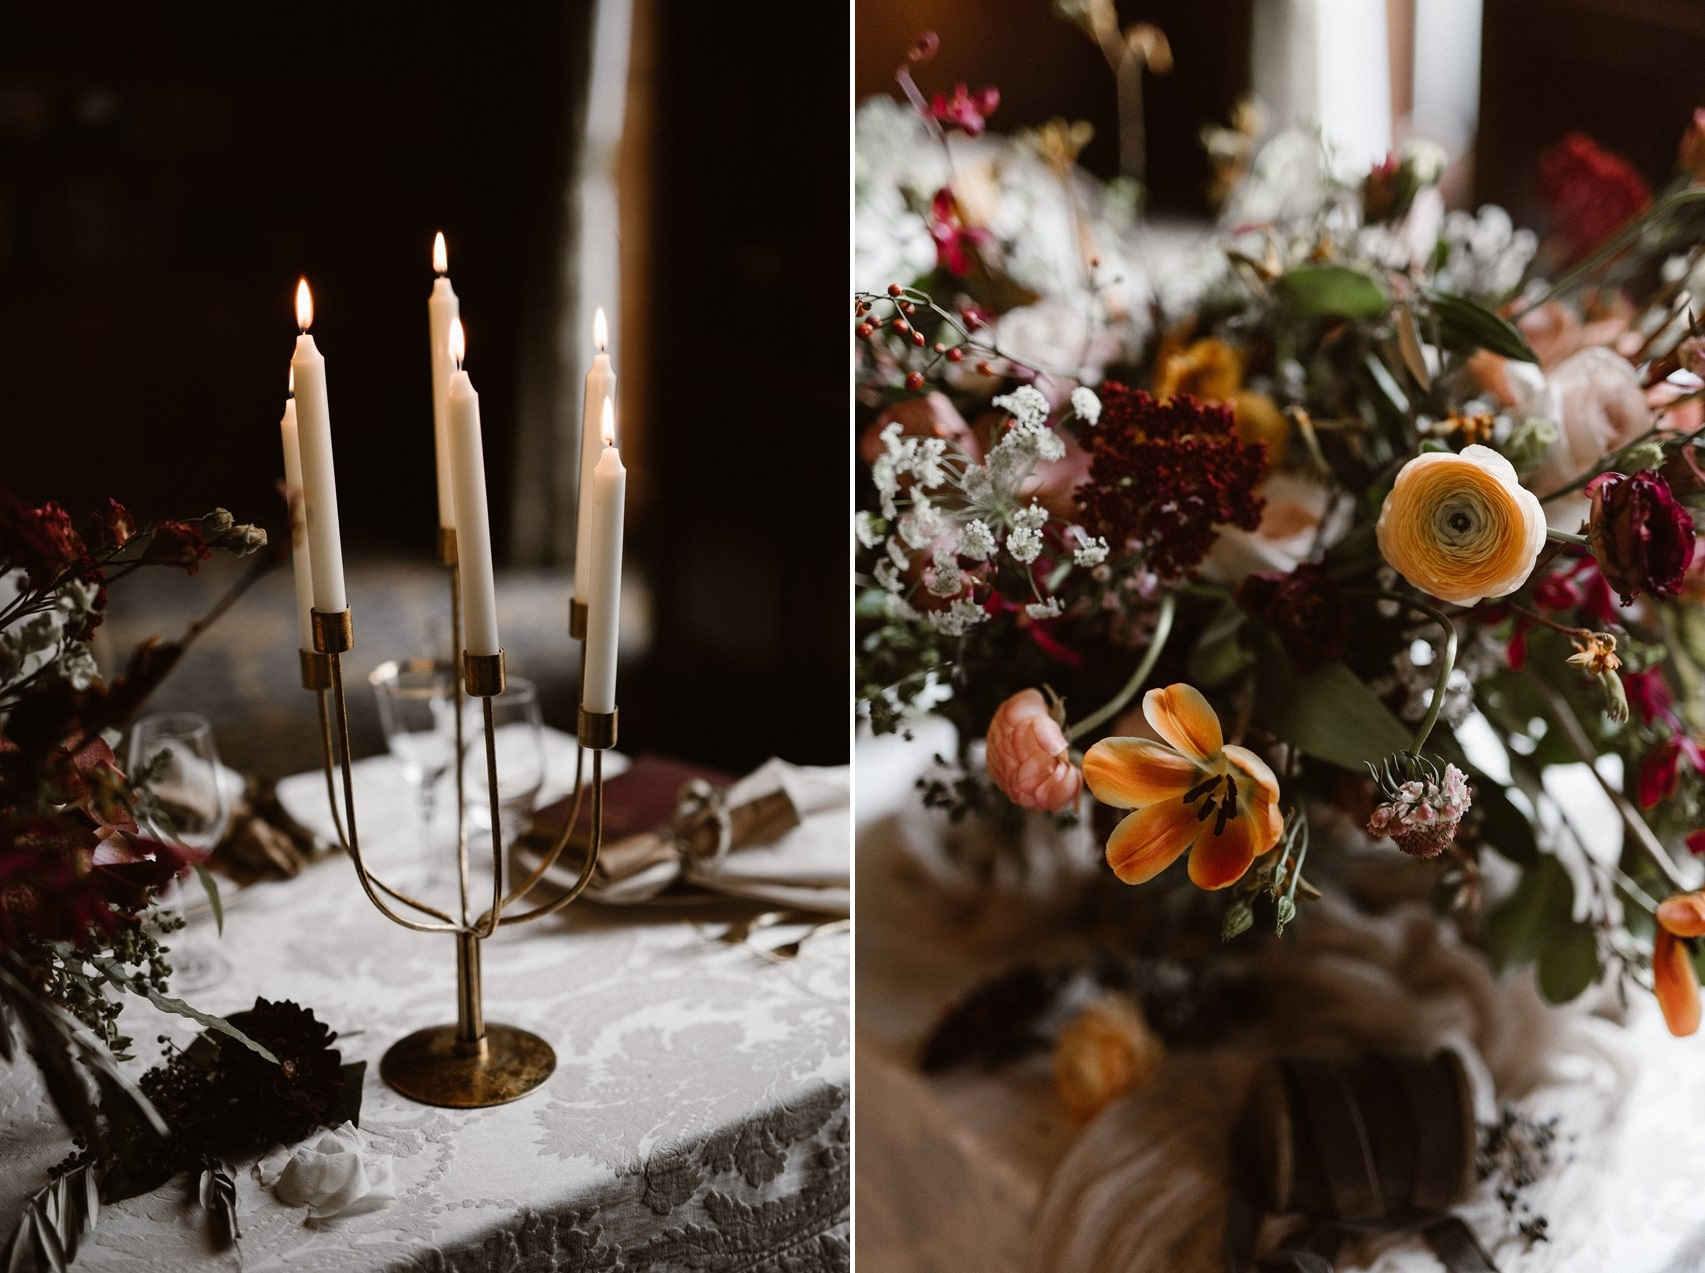 Elegant Modern Vintage Wedding Table Decor